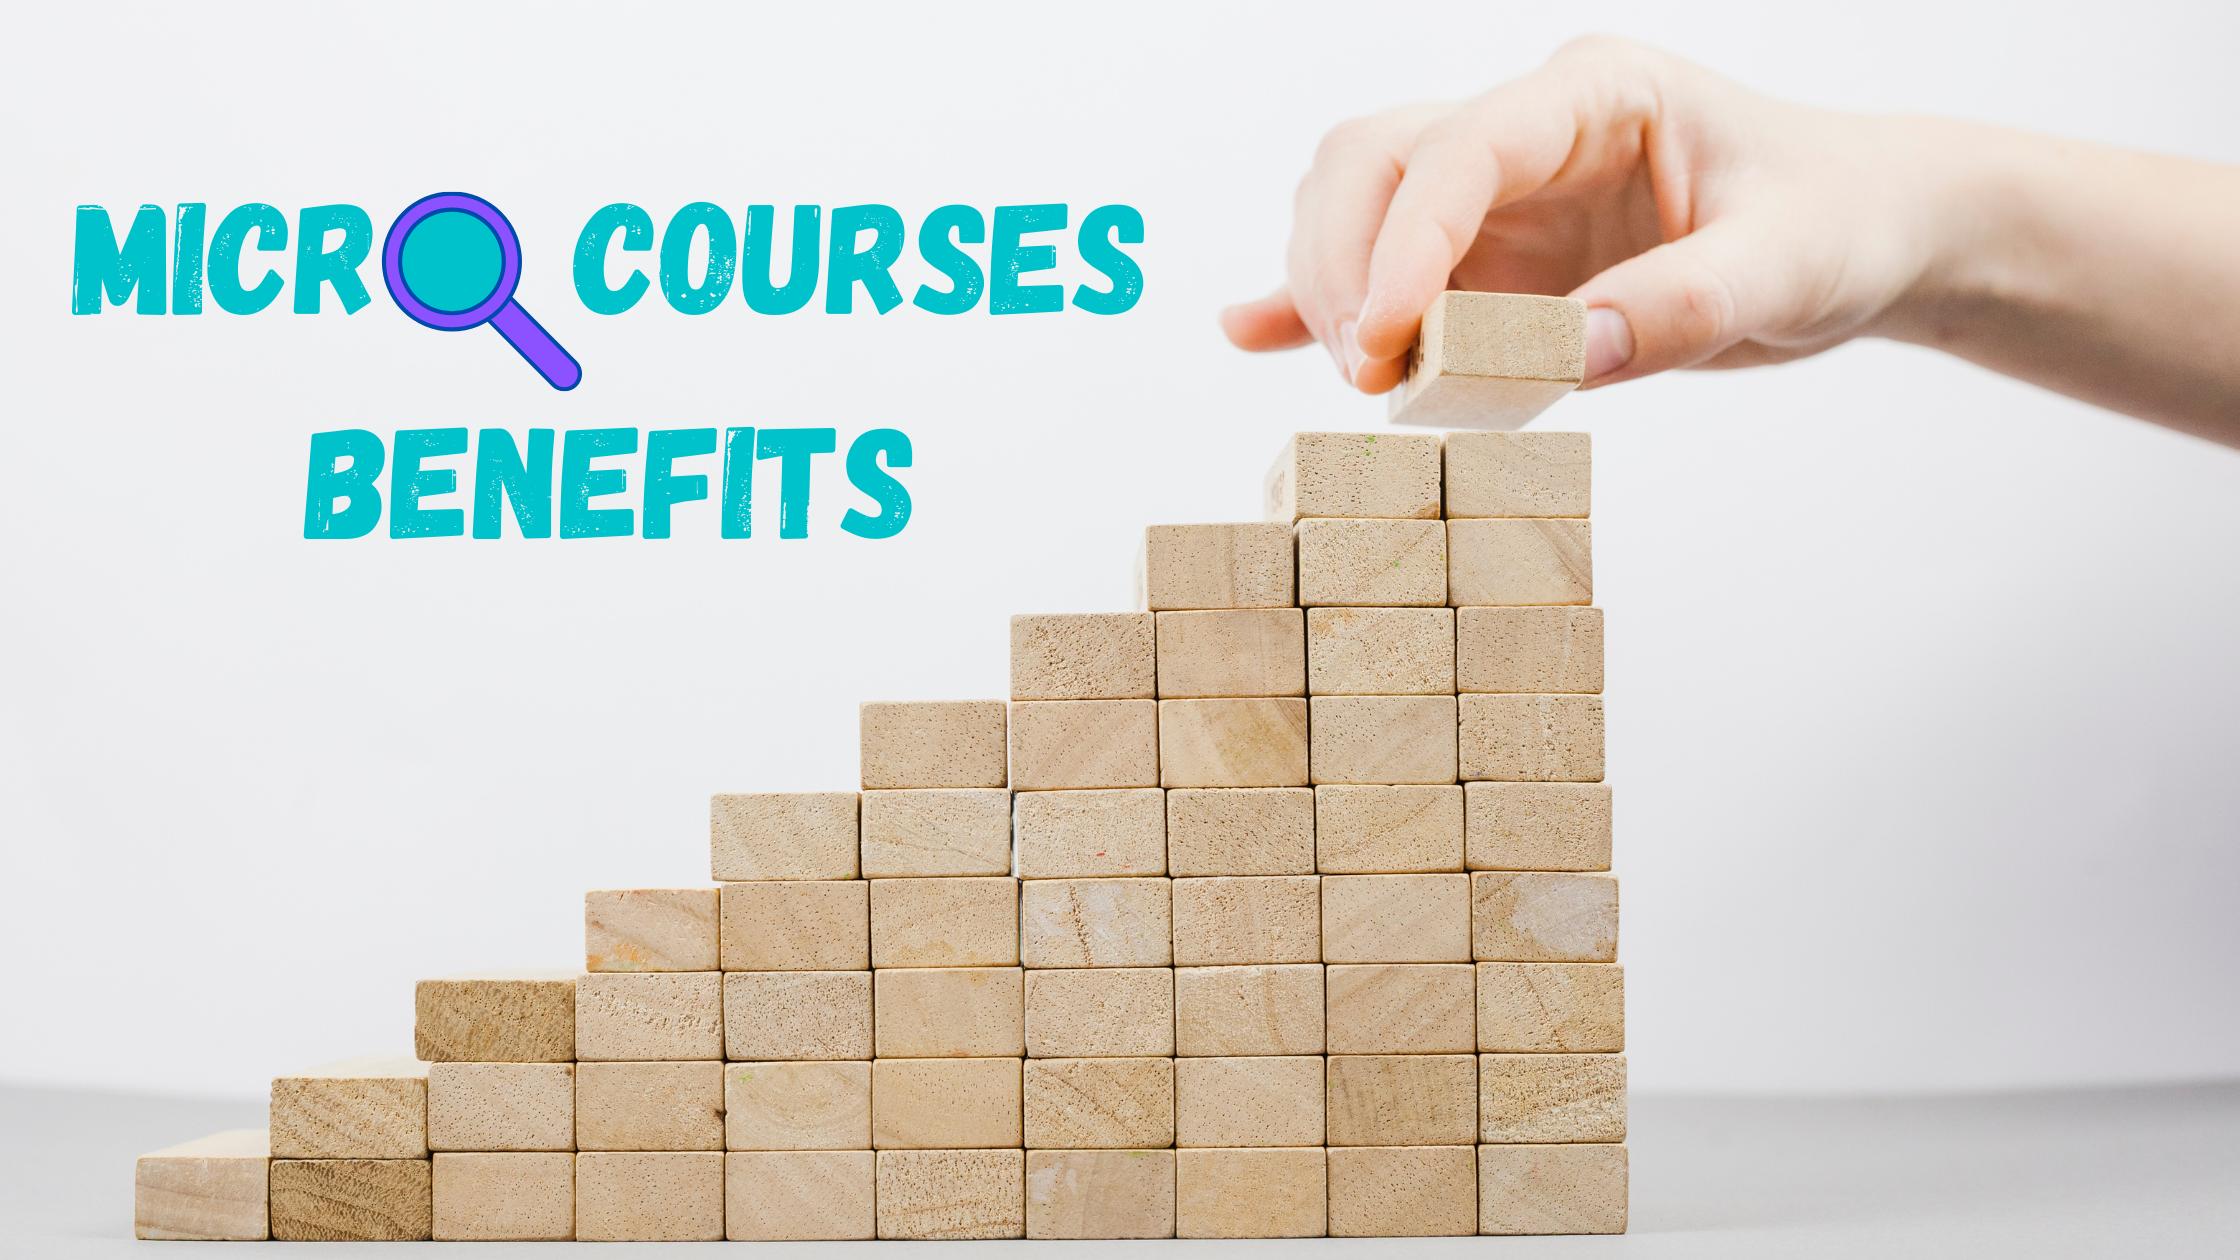 Benefits of micro courses